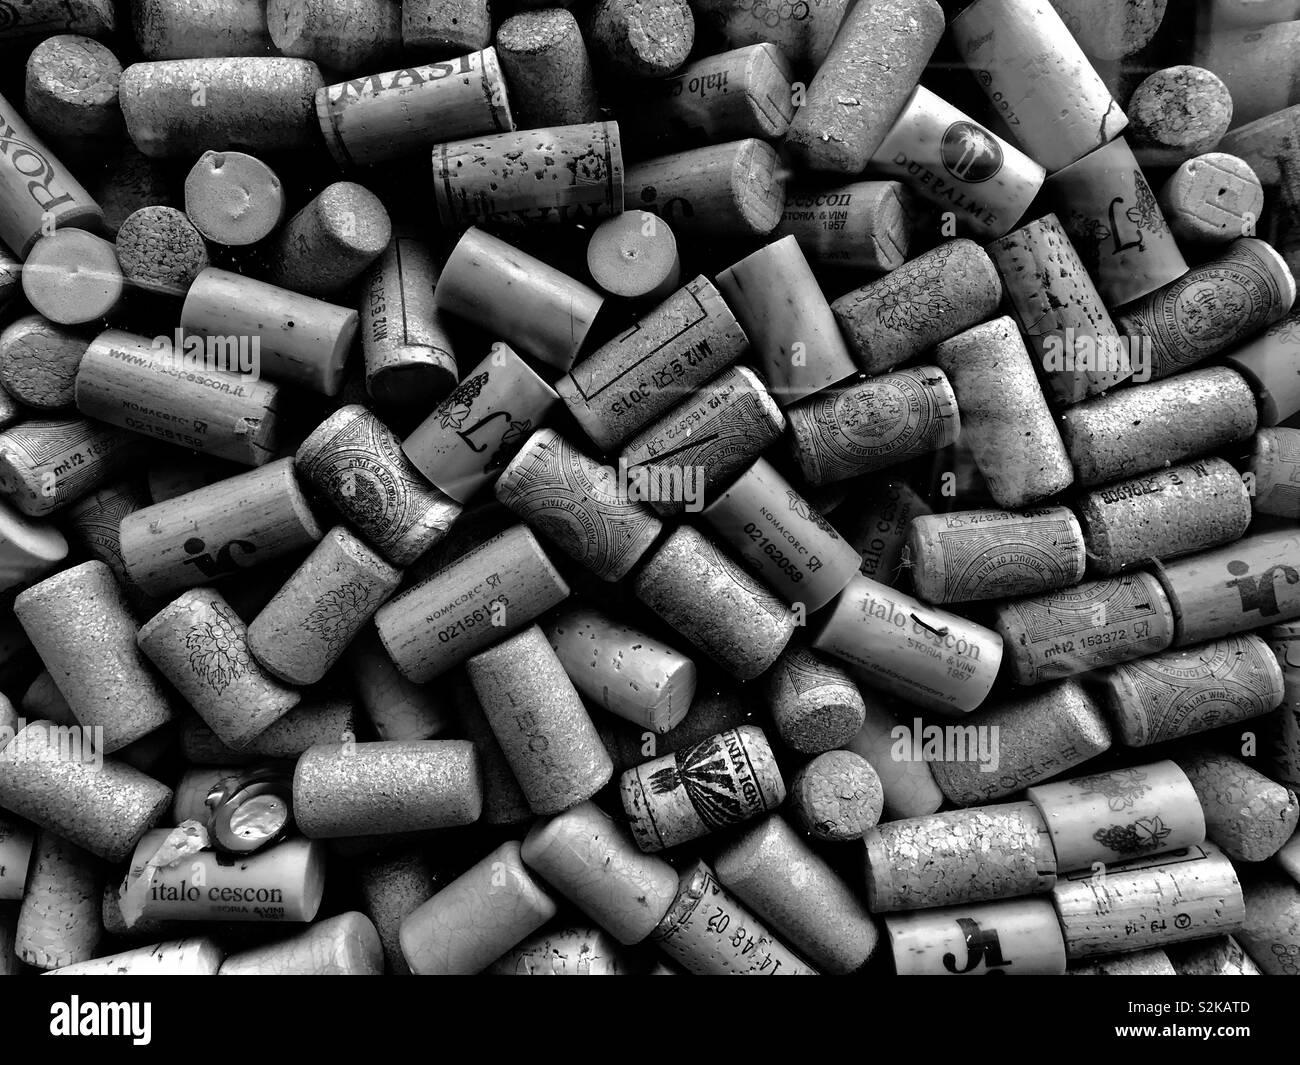 Ebenholz tube